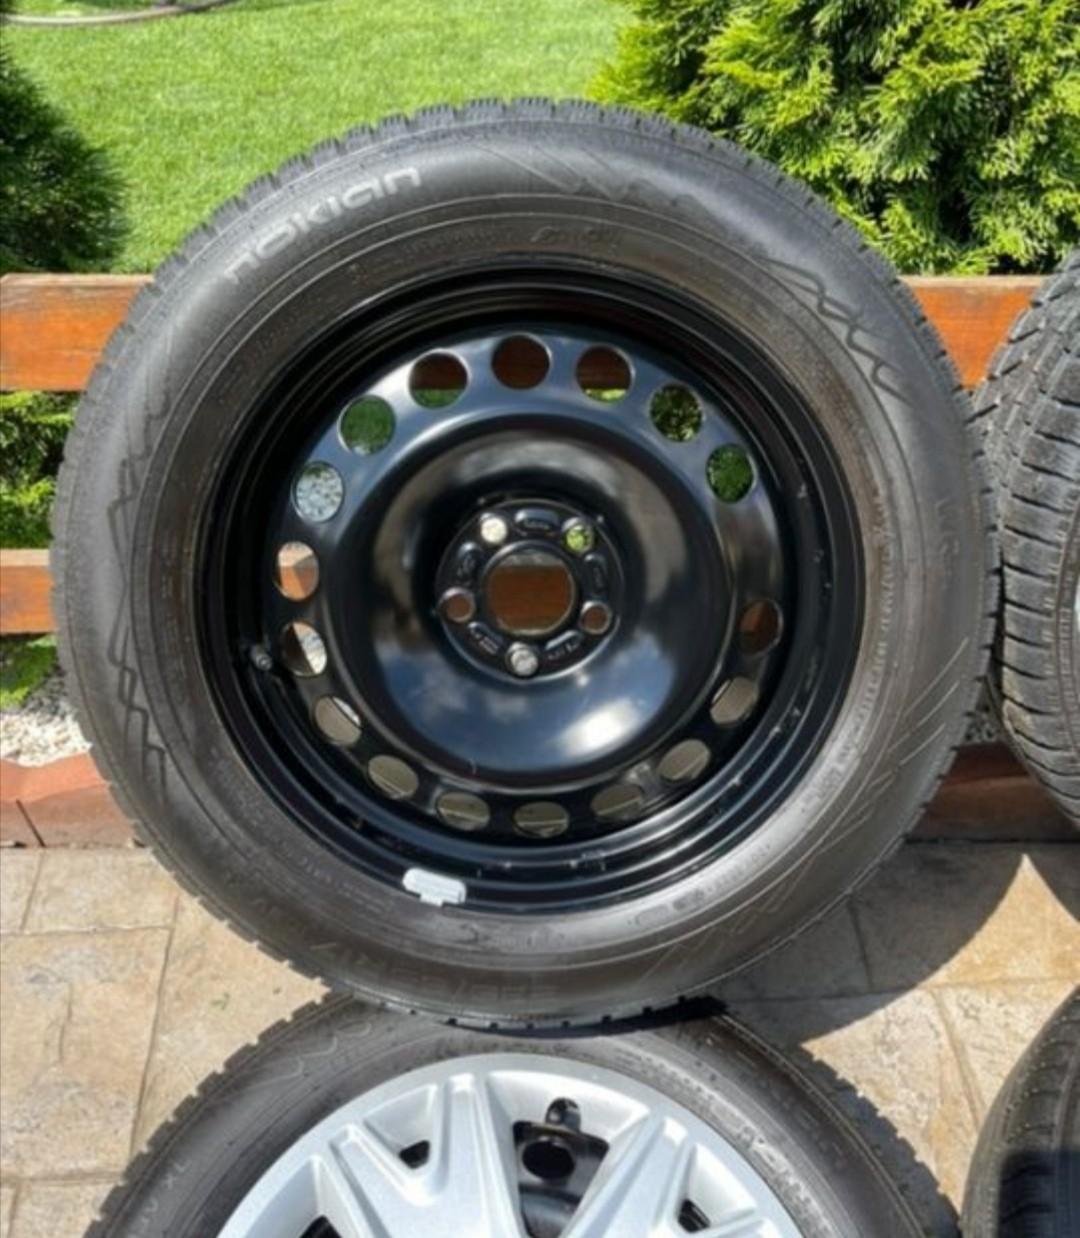 "Jante oțel Ford Kuga 17"", anvelope iarna Nokian ca noi, senzori presiune"